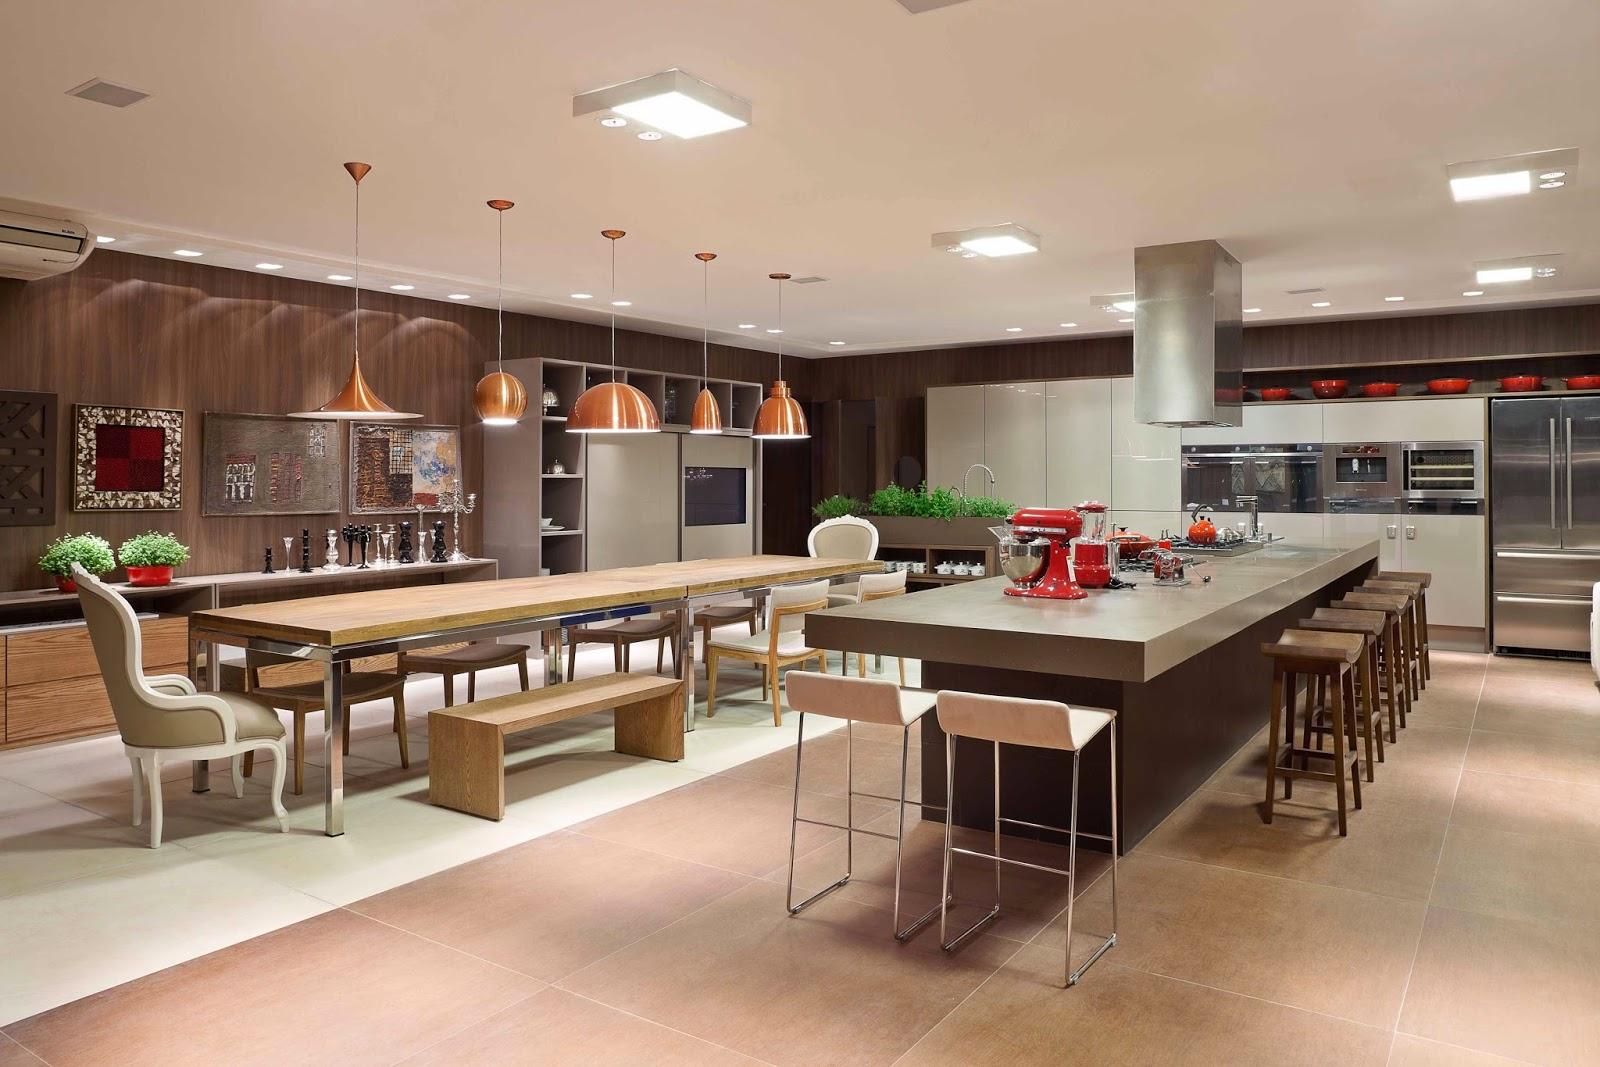 Construindo Minha Casa Clean Decora O De Salas De Jantar Com  -> Lustres Pendentes Para Sala De Jantar Pequena